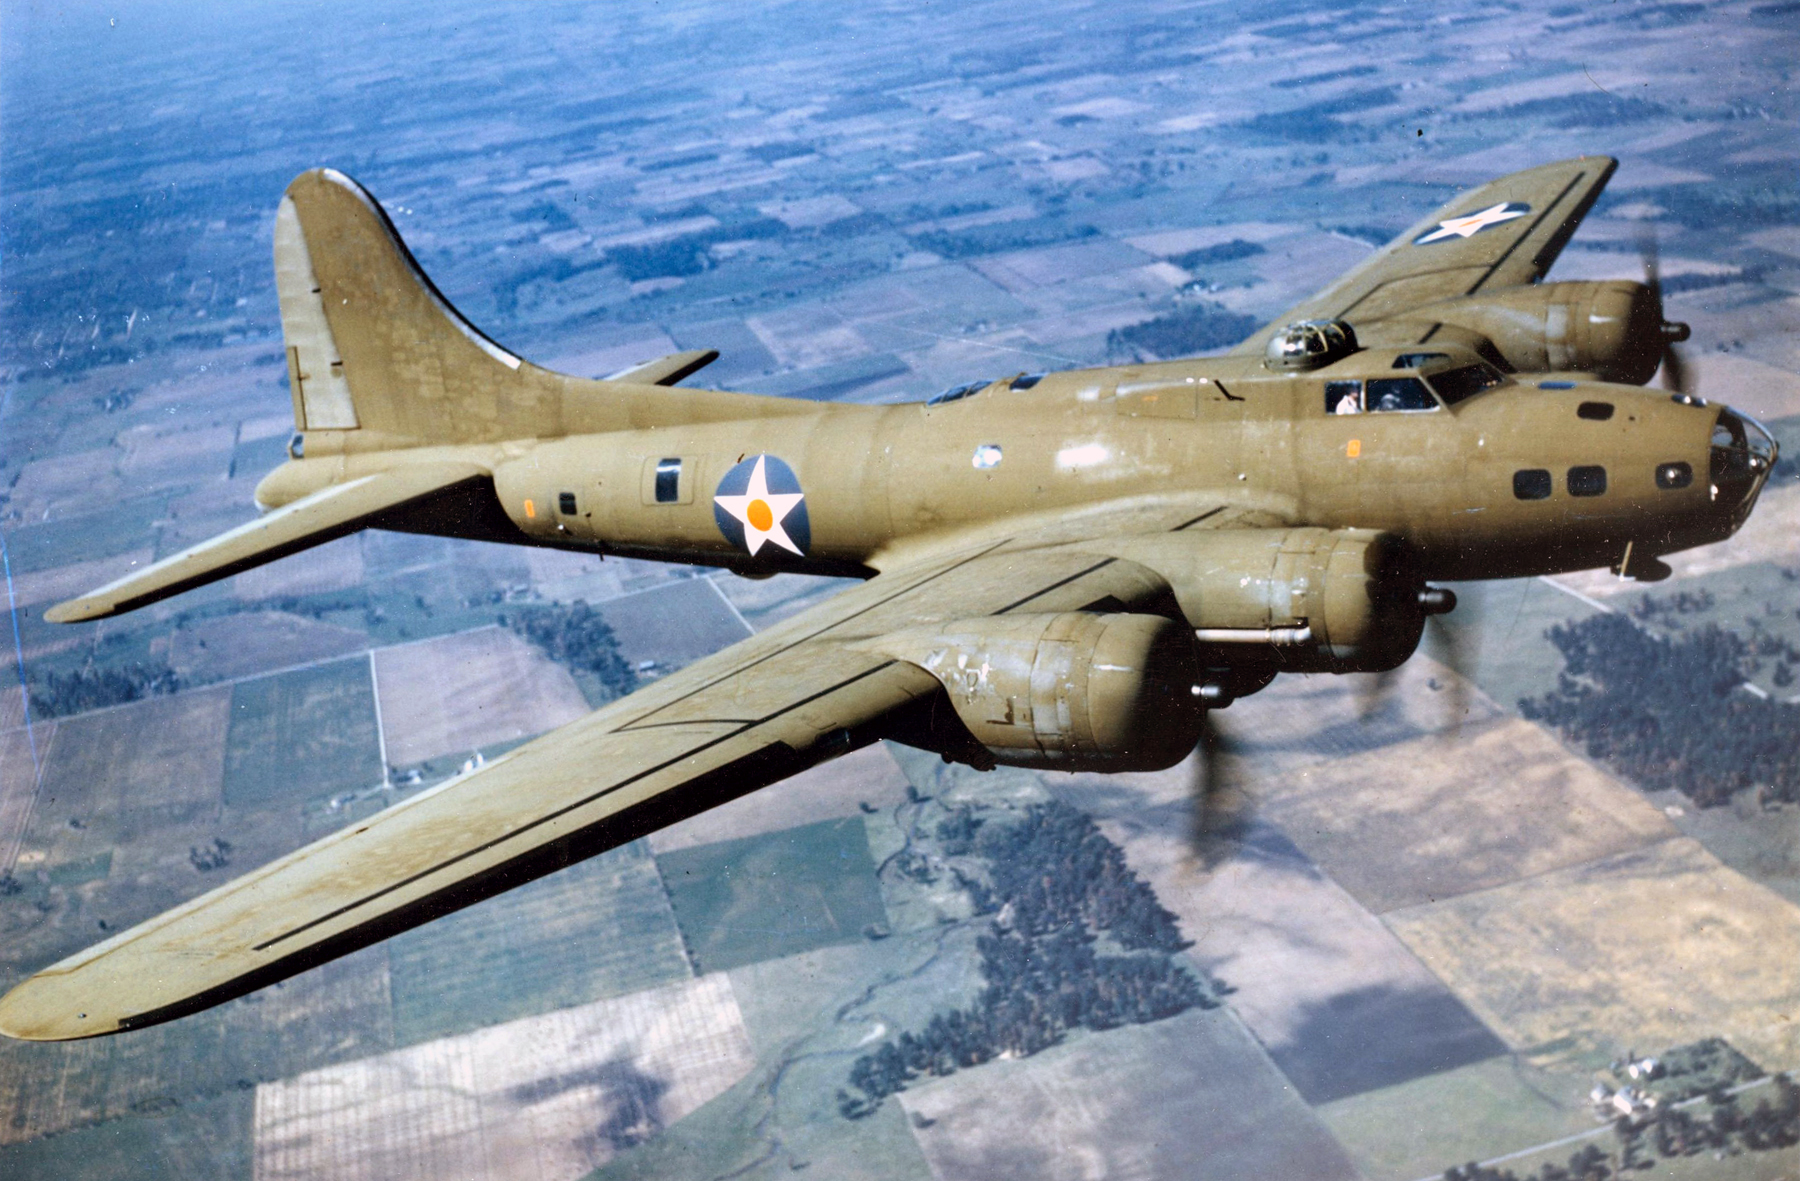 B-17 #41-2393